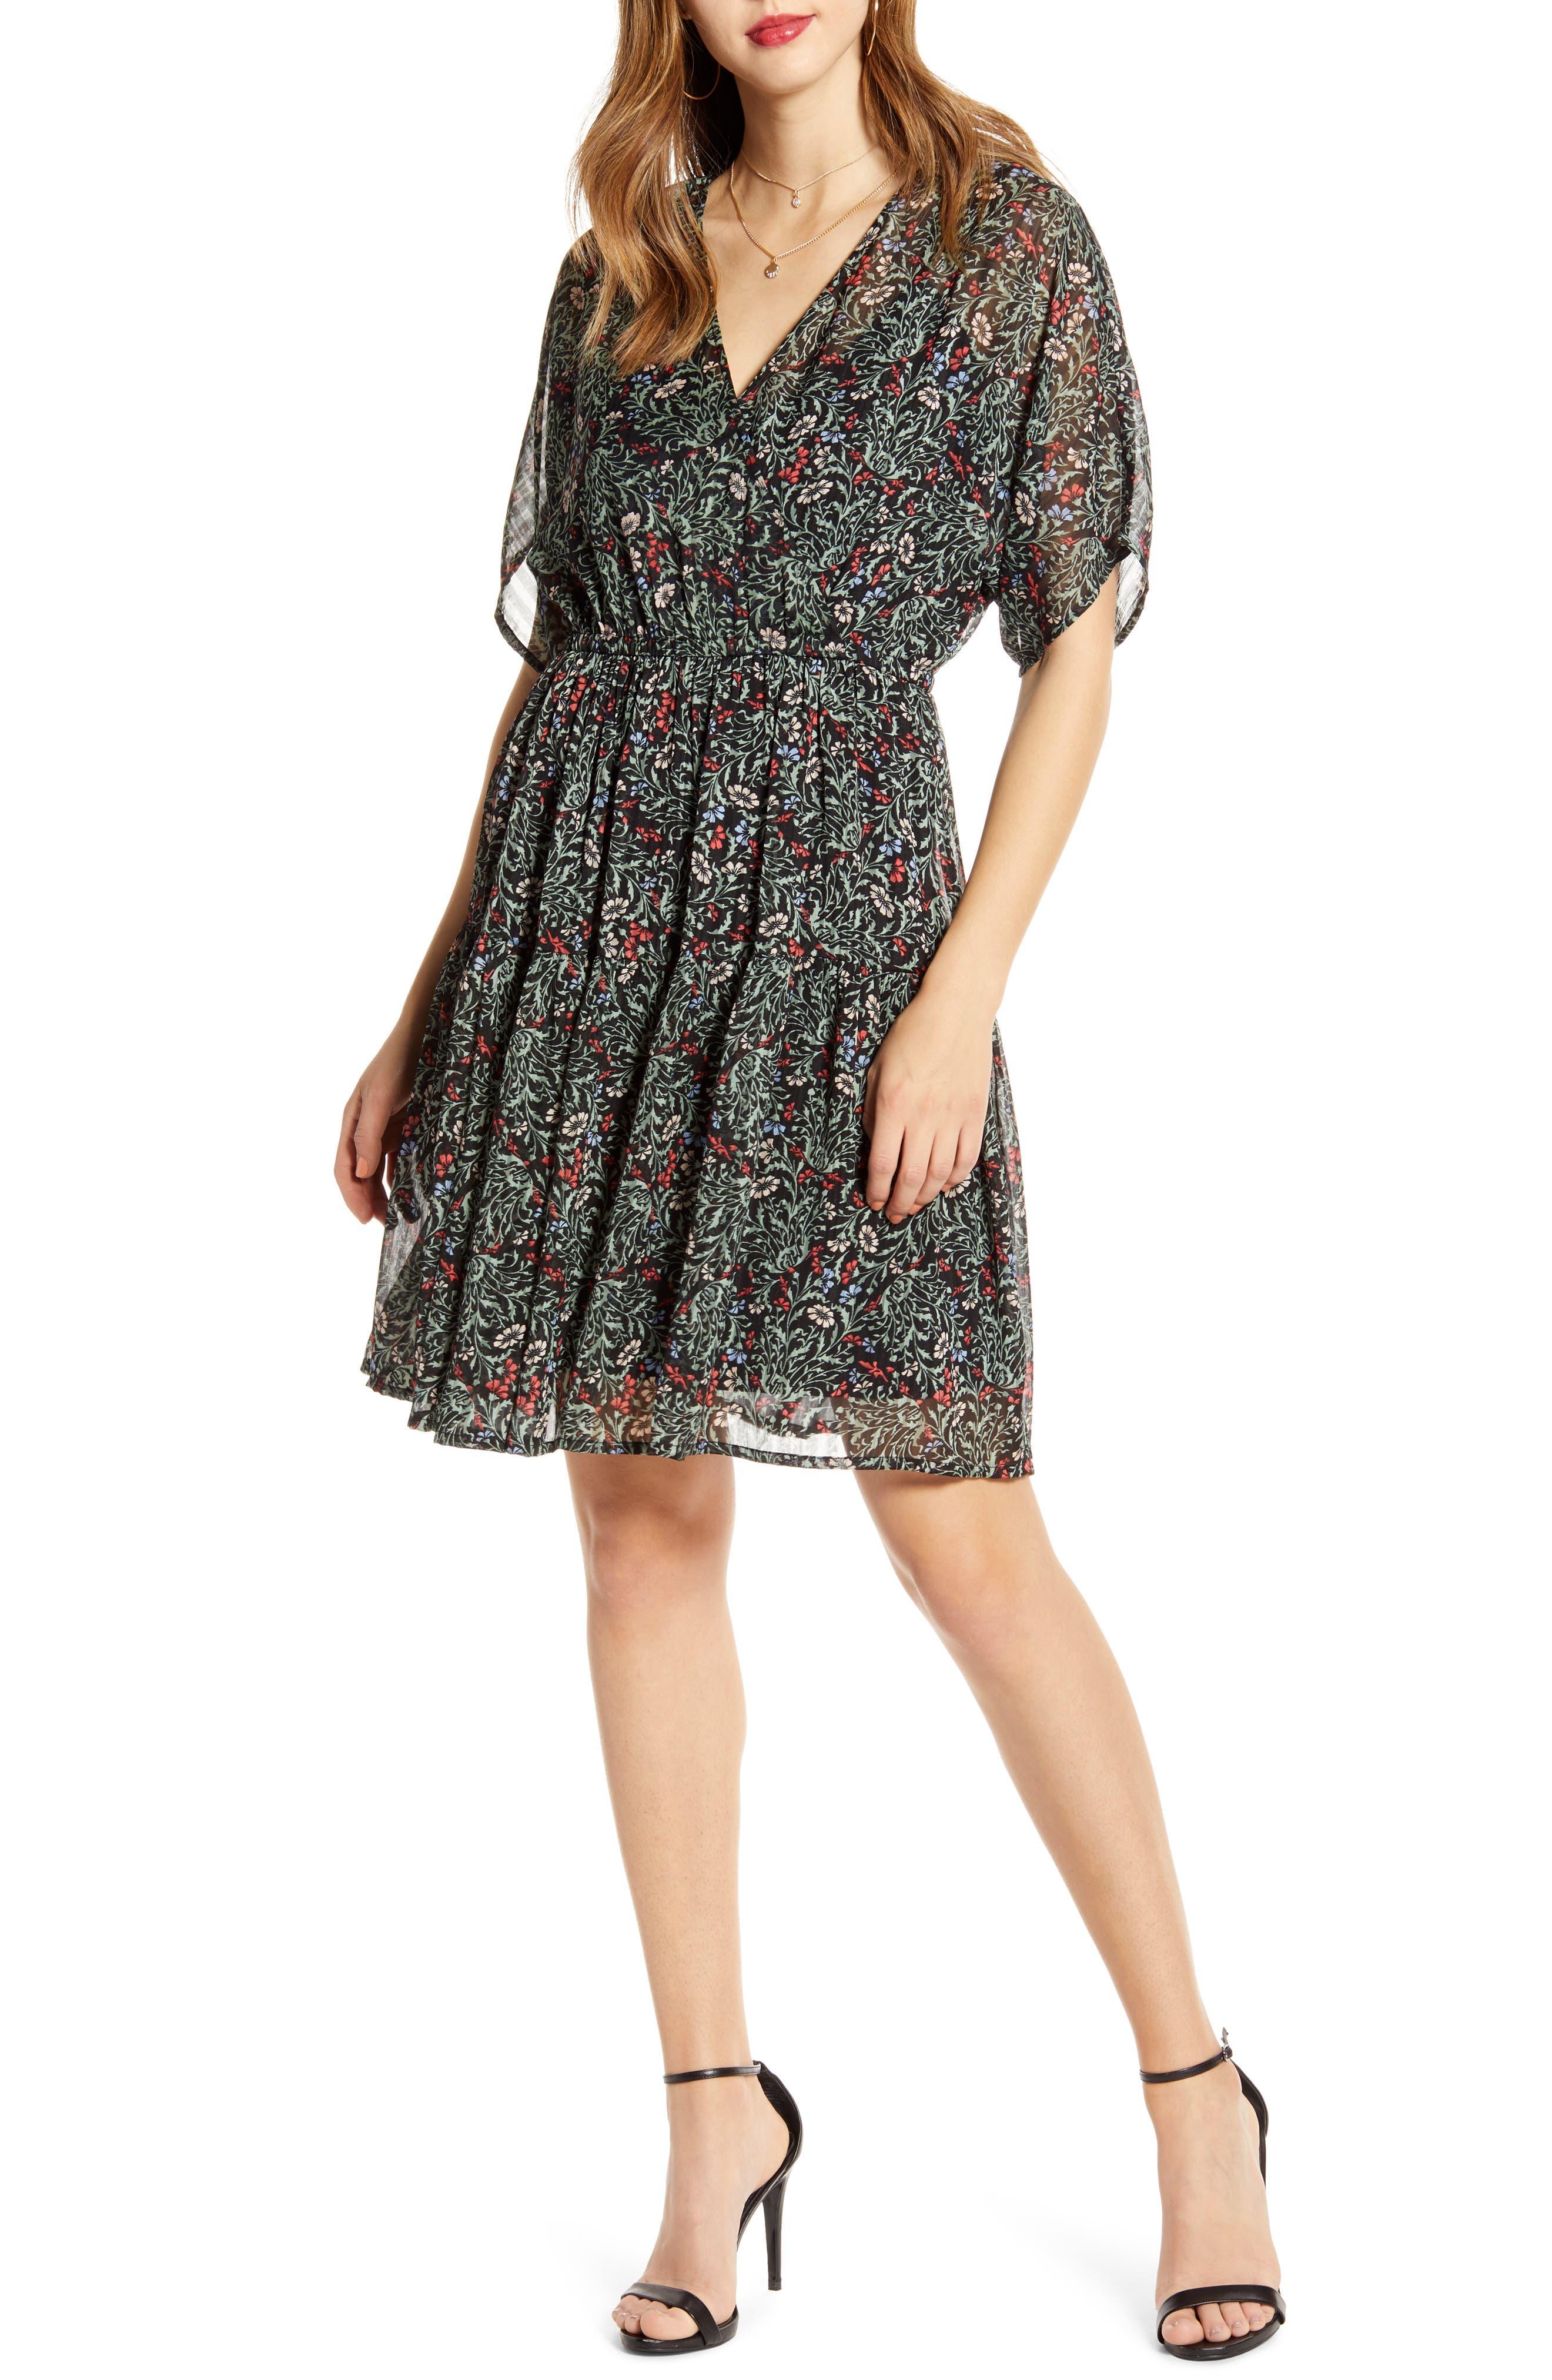 Vero Moda Liva Floral Print Chiffon Dress, Black